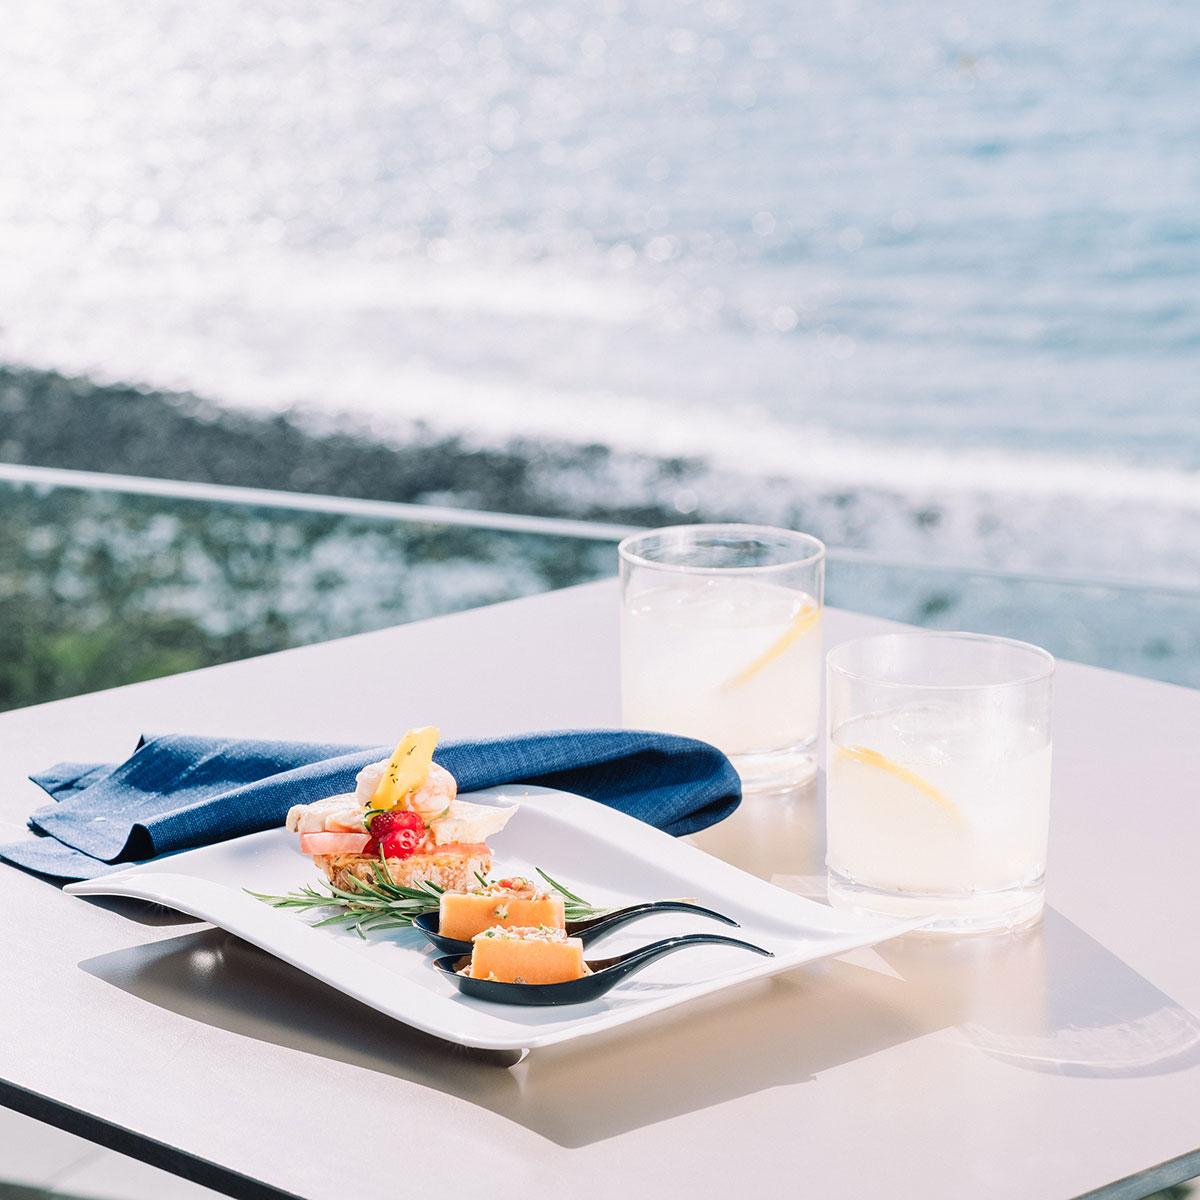 Spring Hotels Arona Gran